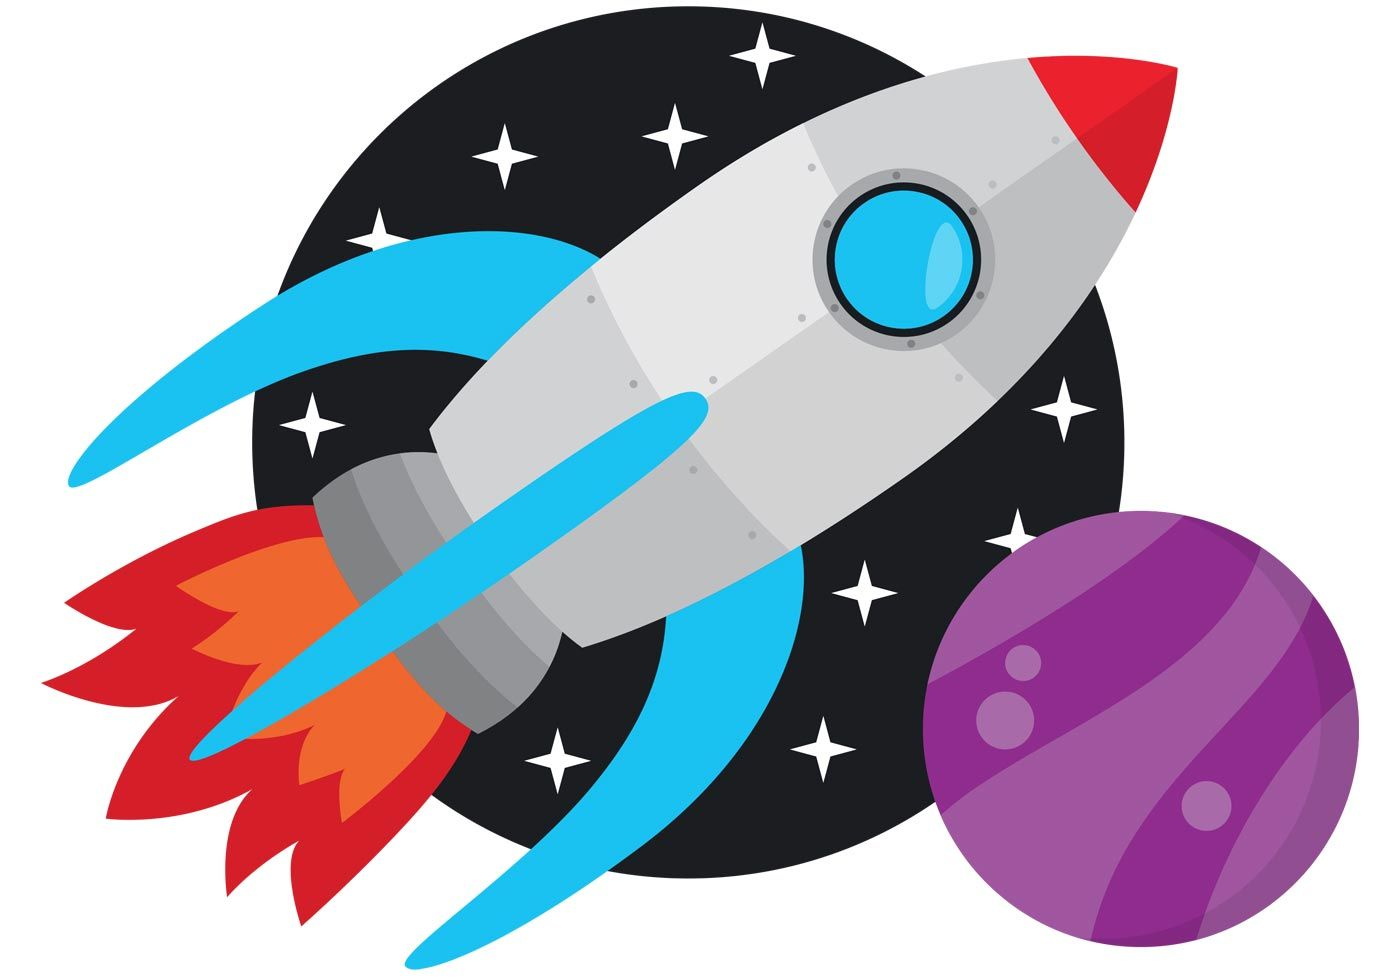 Space Rocket Vector | Clip art, Free vector ornaments, Free vector clipart